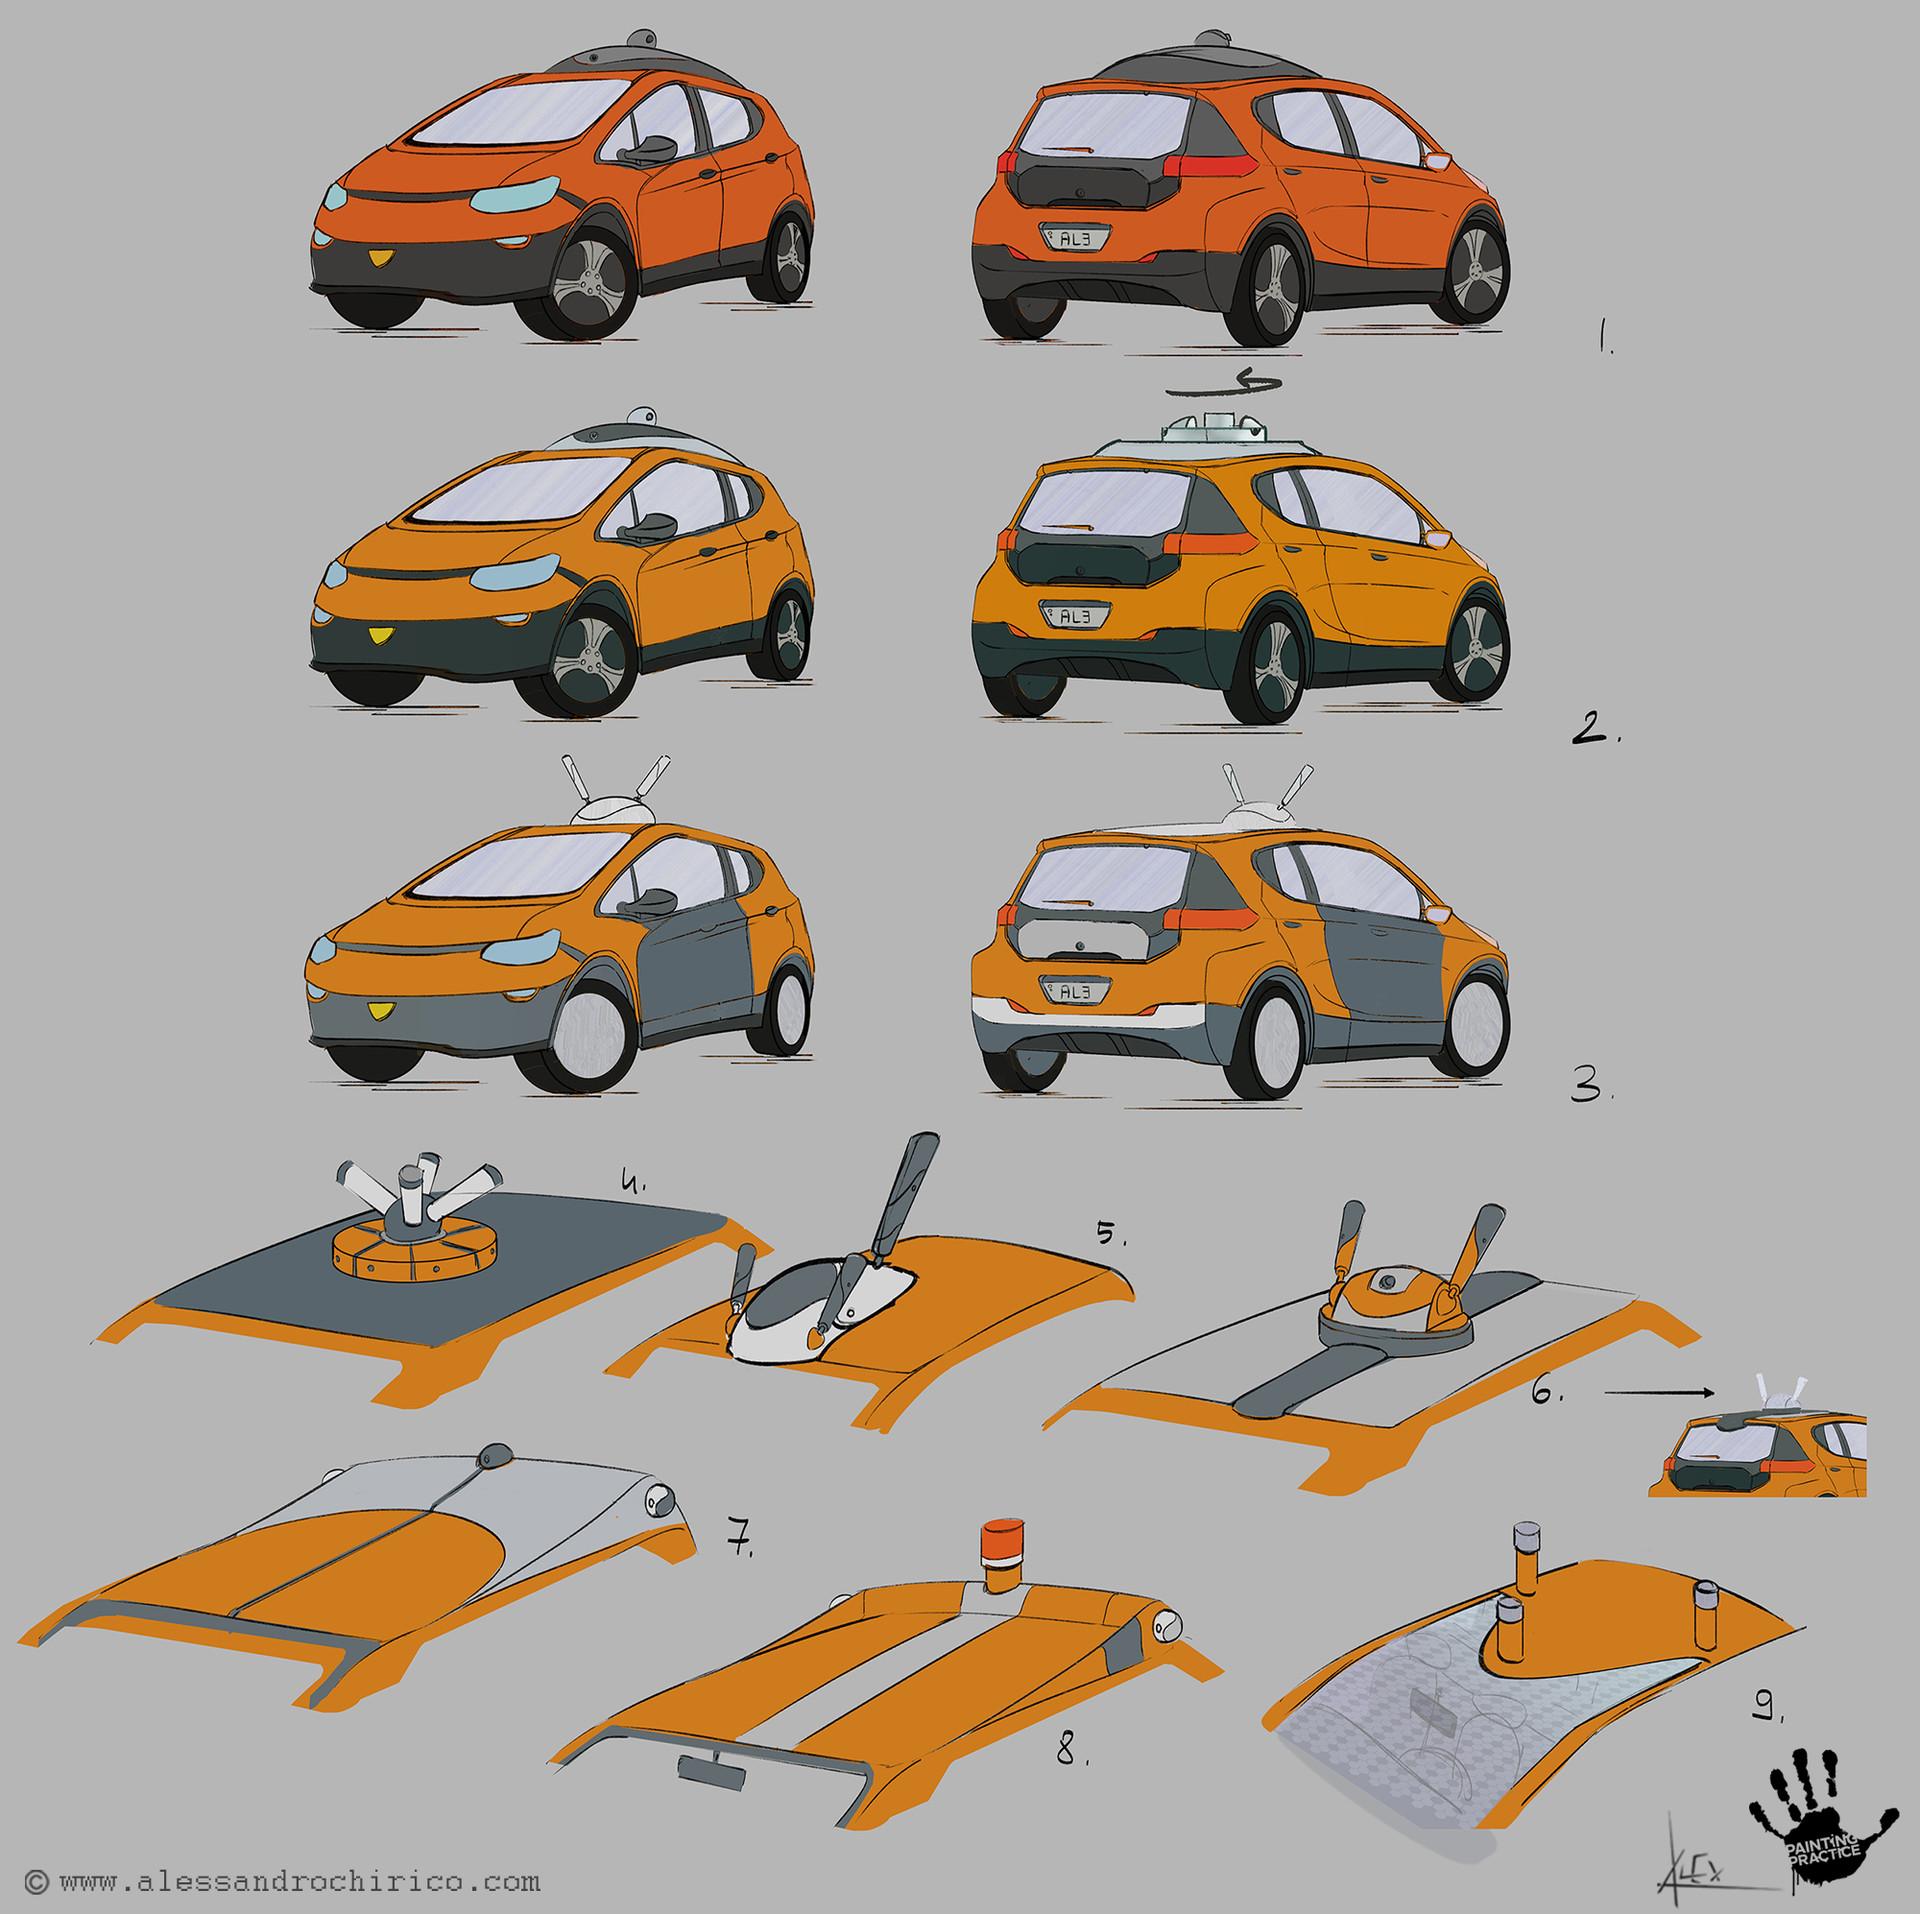 Alessandro chirico 19 car sketches alessandro chirico